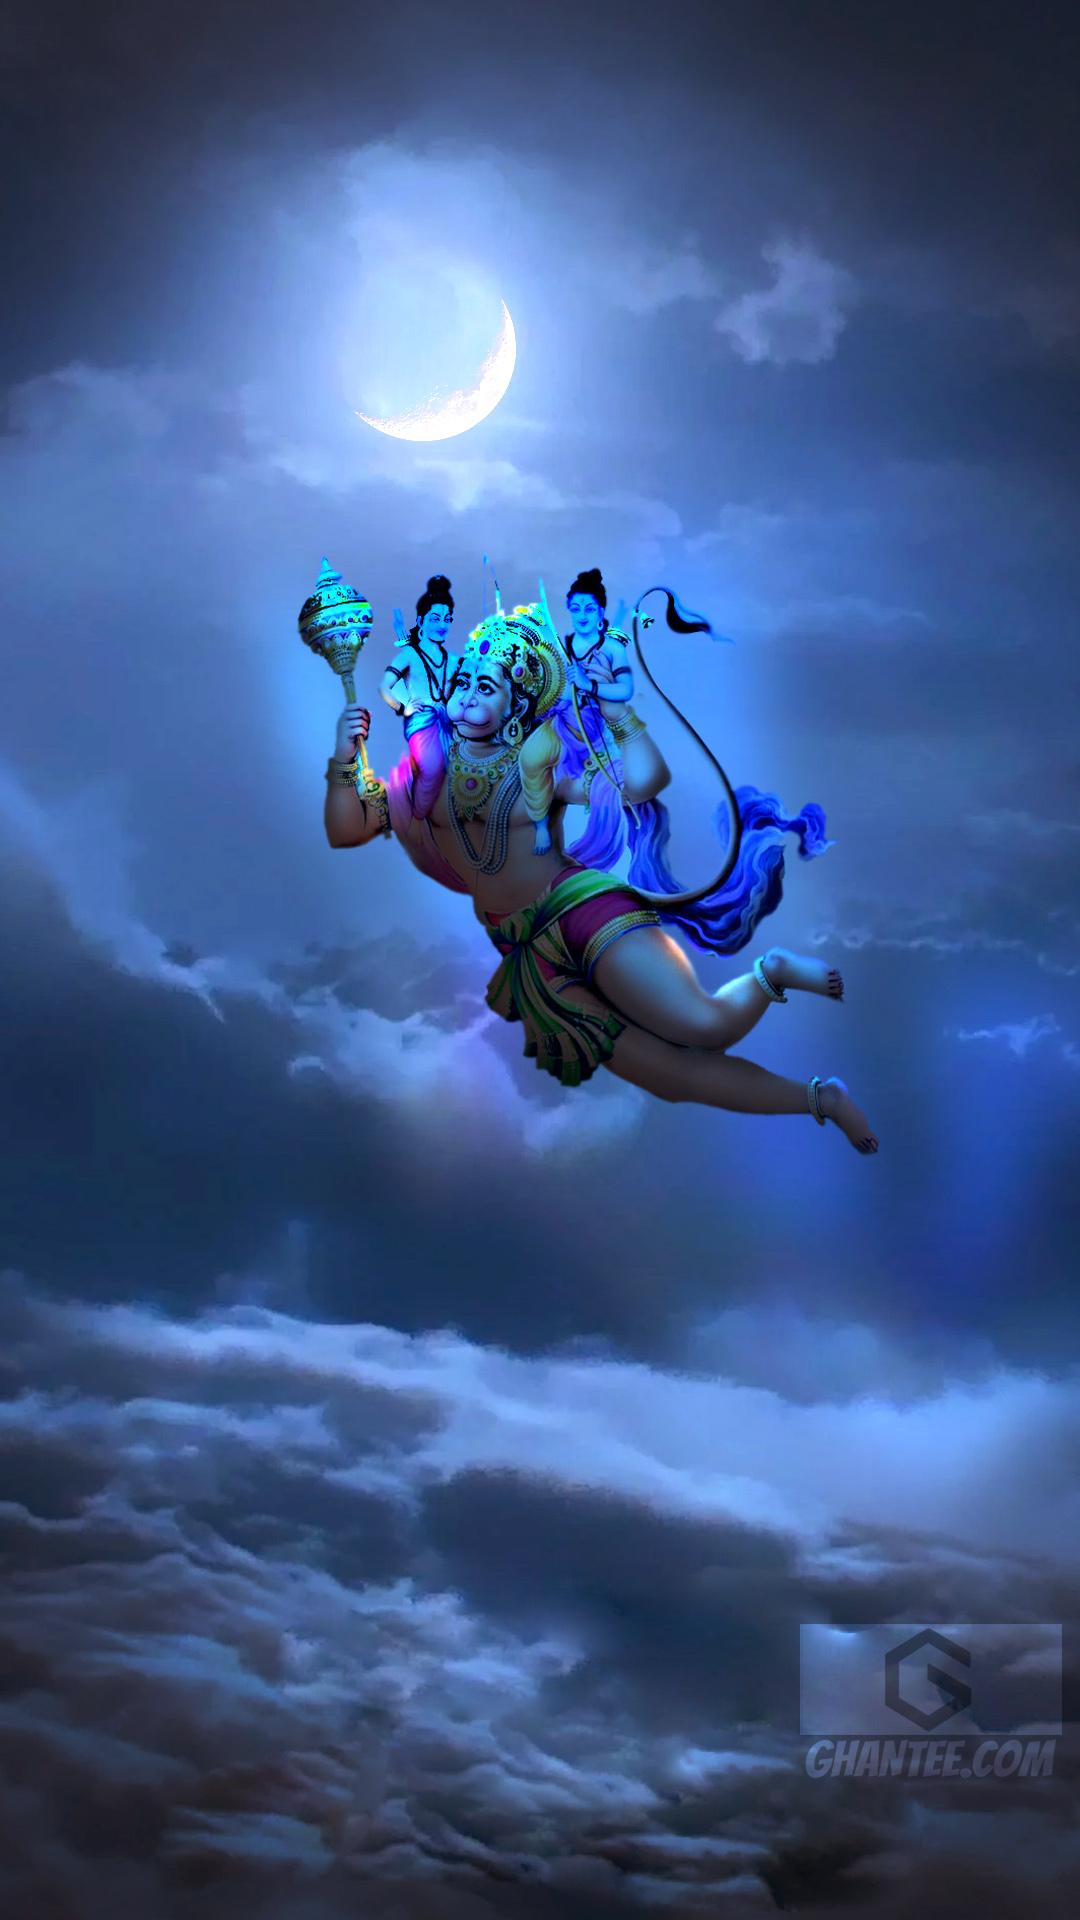 beautiful bajrangbali image flying with ram and lakshman